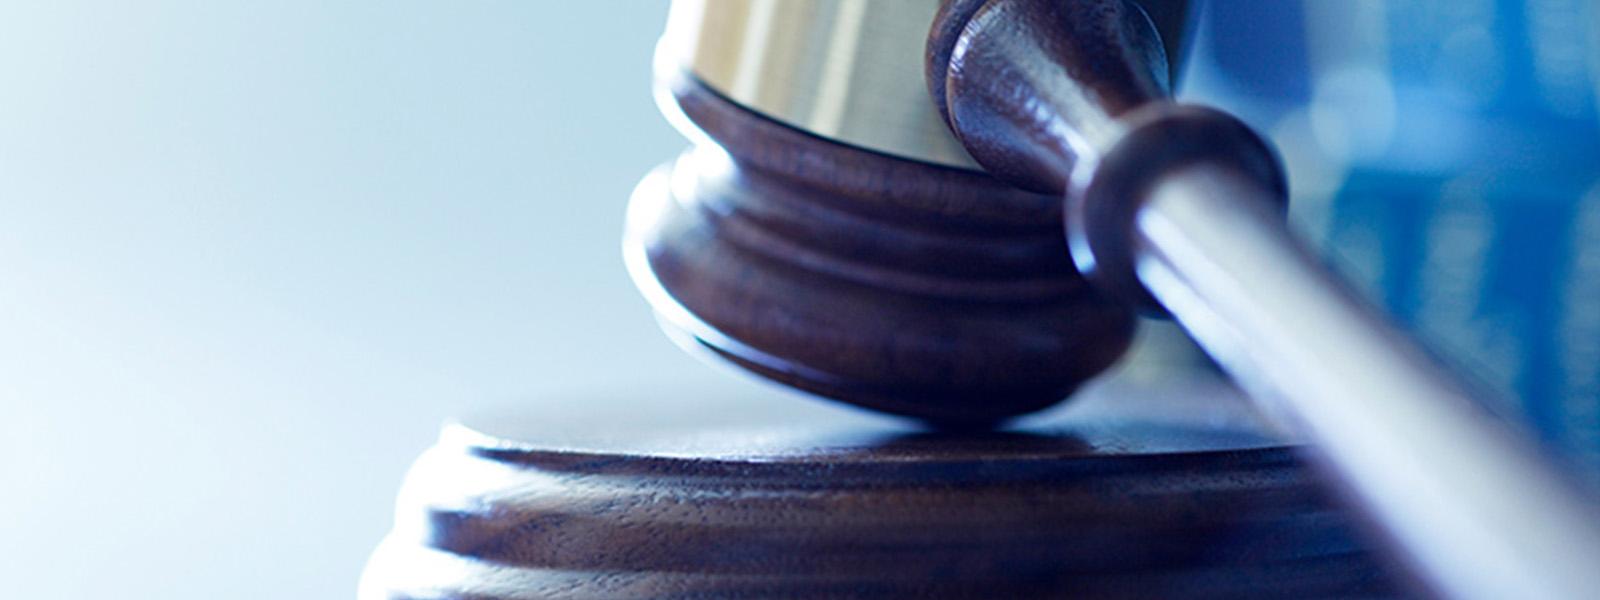 personal-injury-attorneys